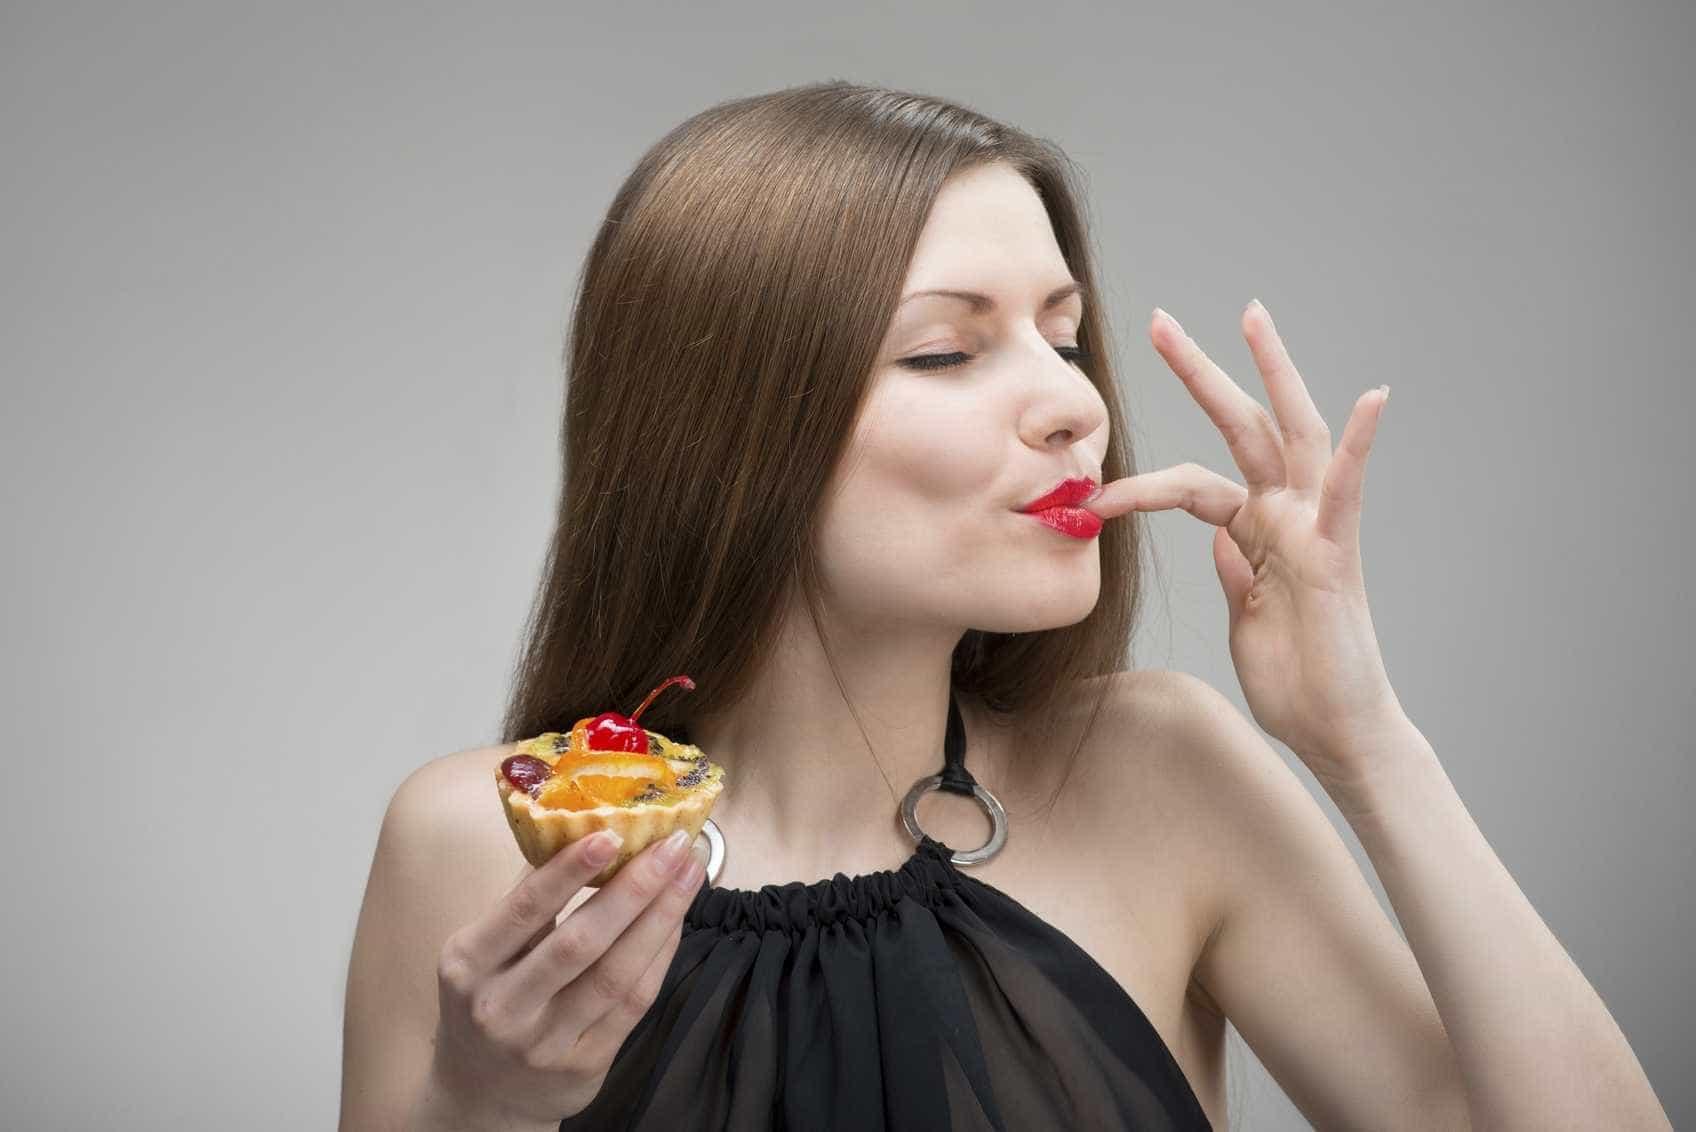 dieta del limon para perder peso en 5 dias